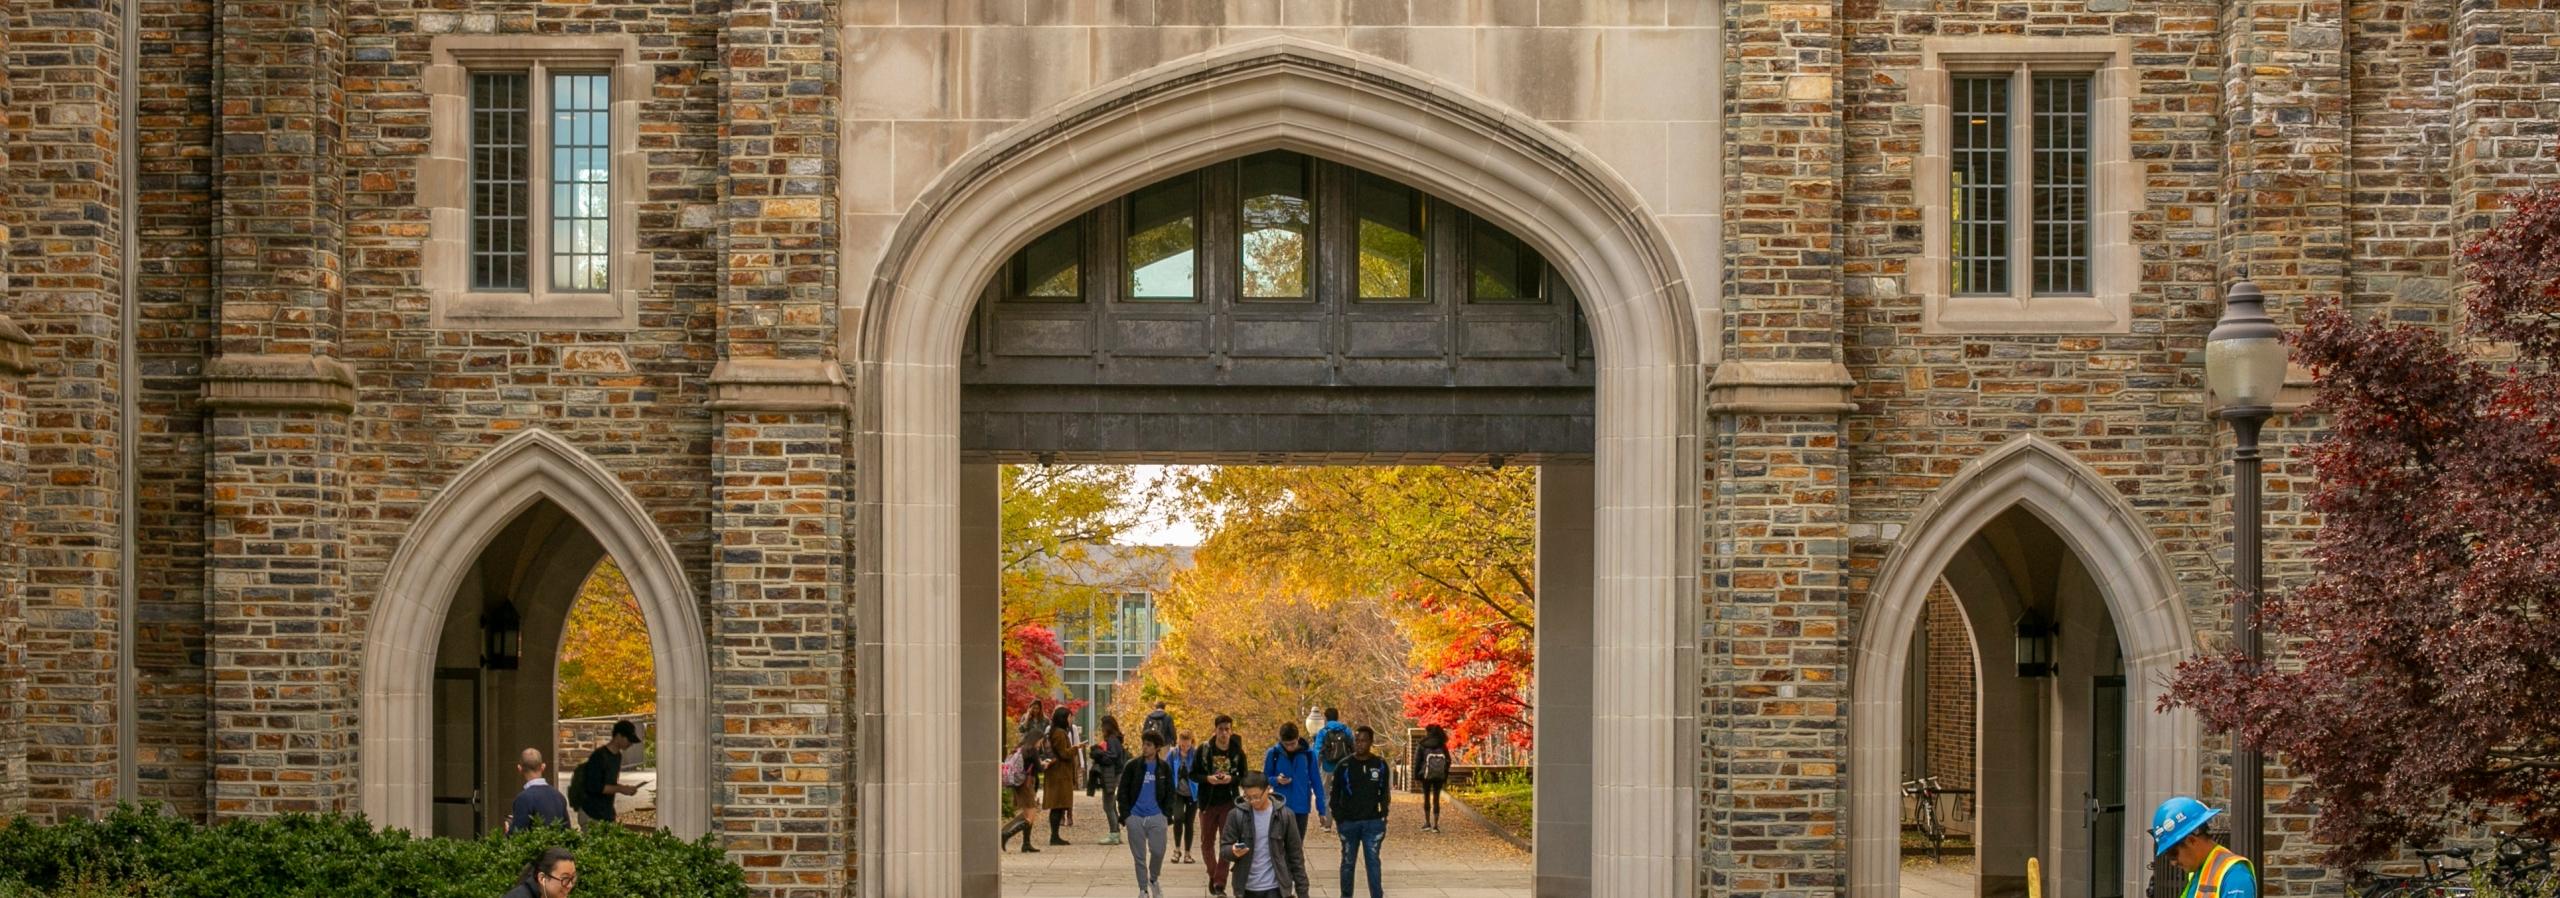 Duke University campus in autumn